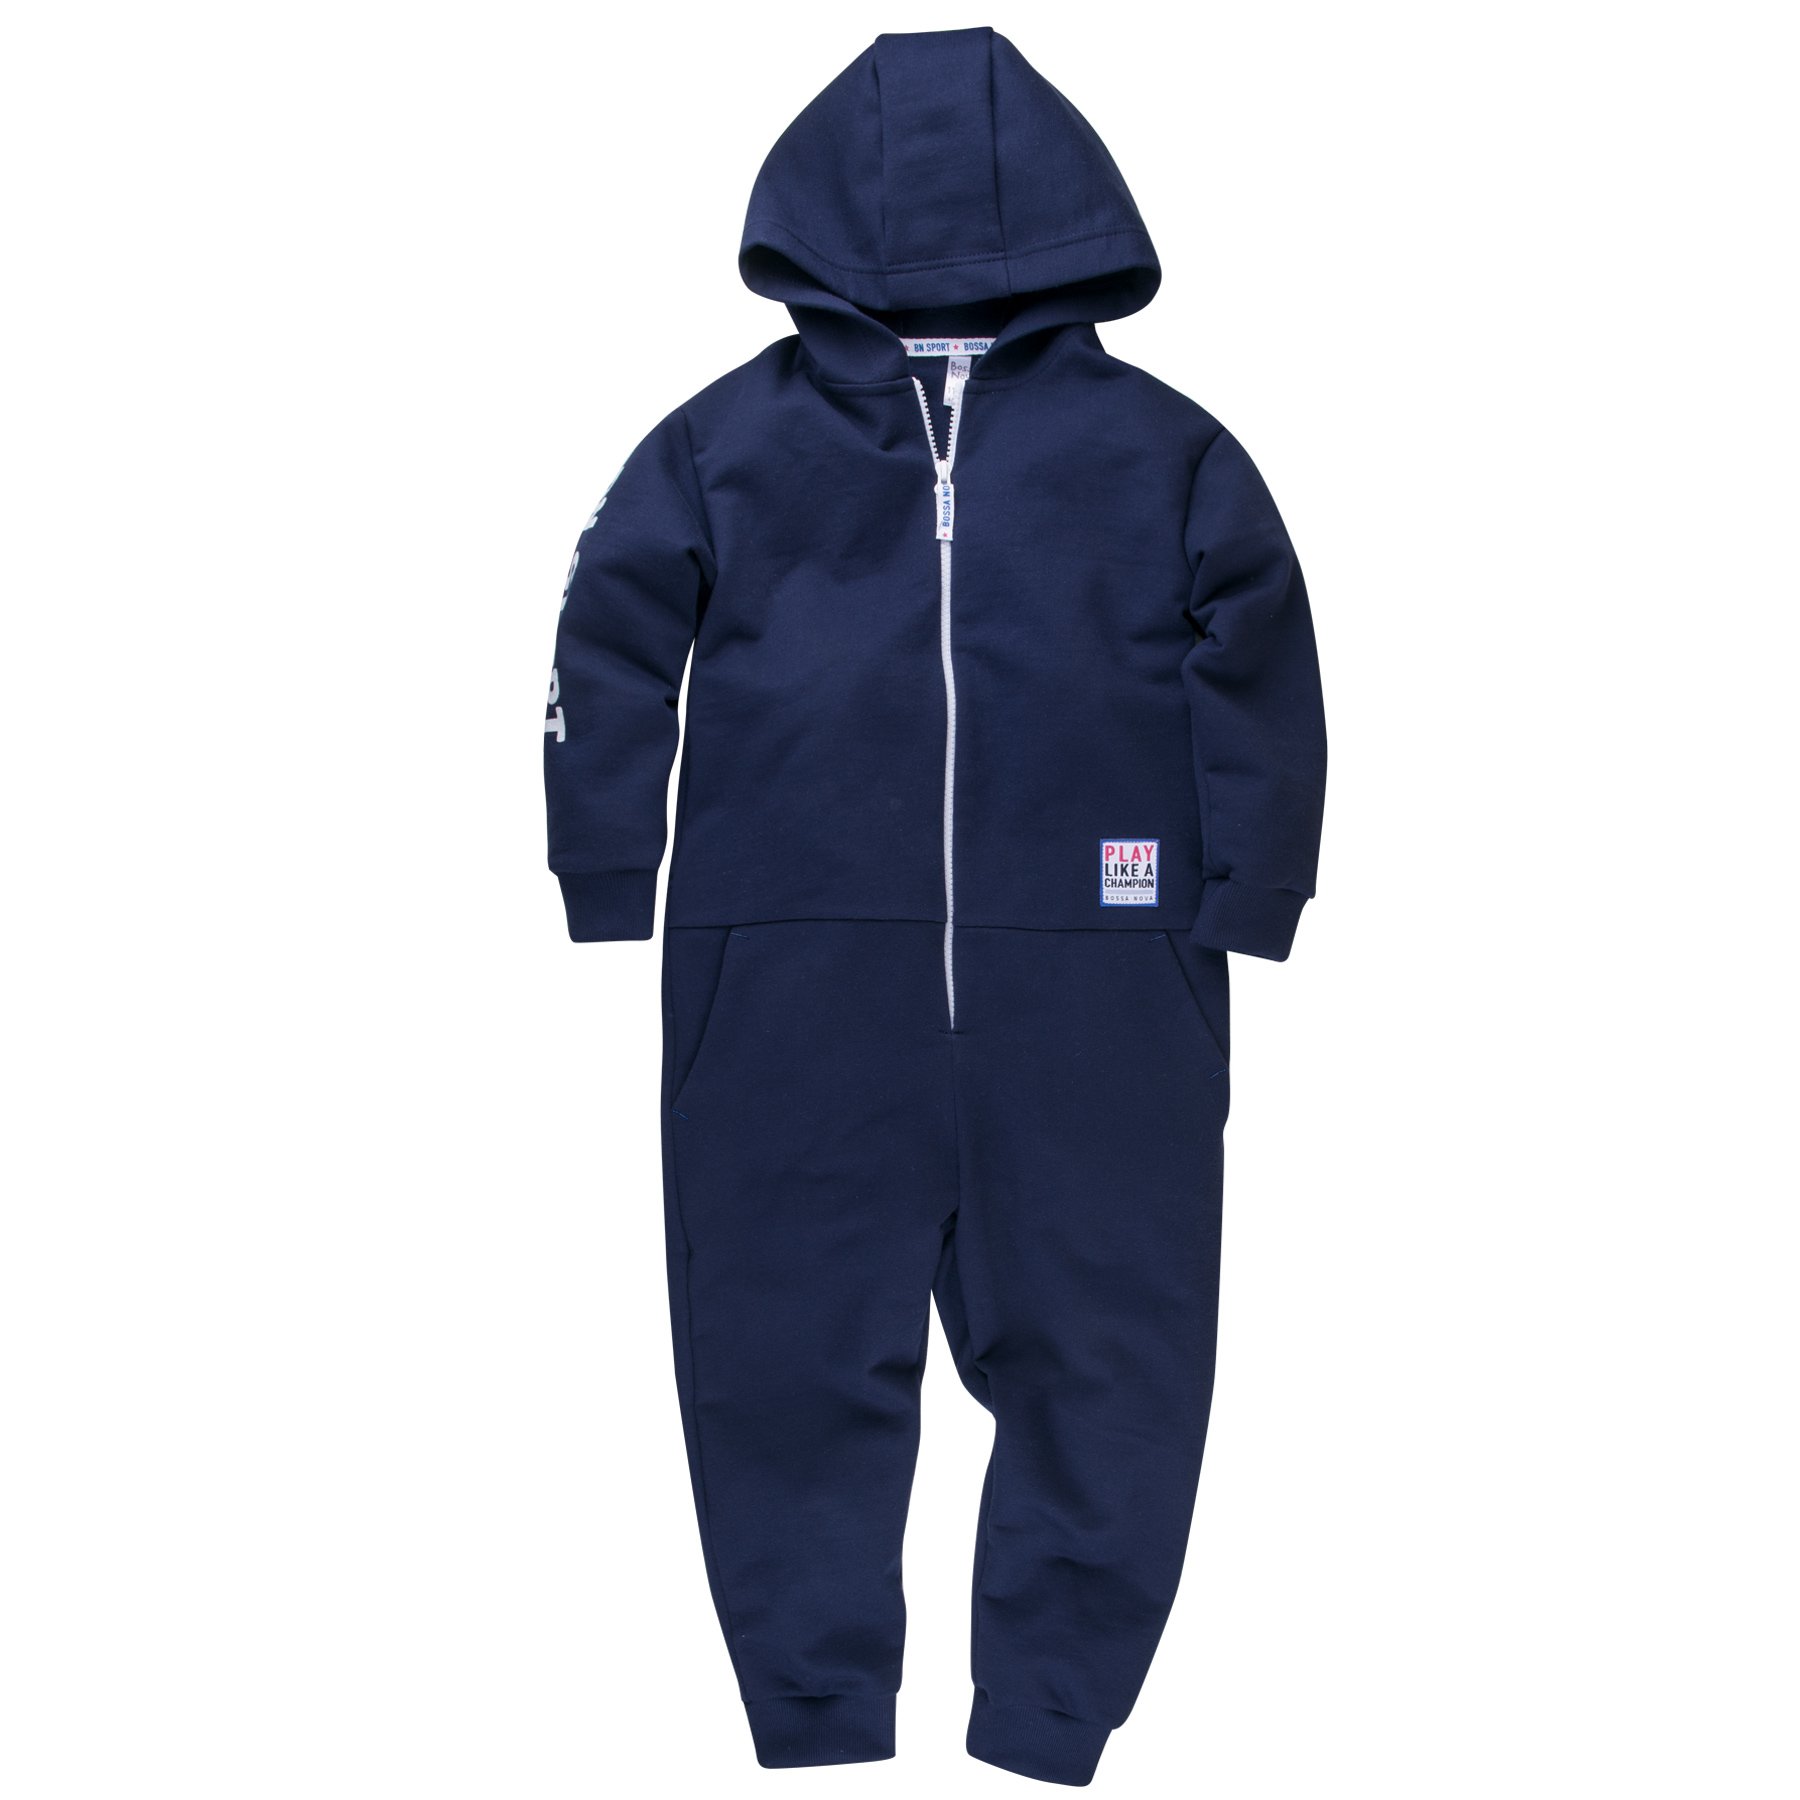 Jumpsuit with hoodie for boy BOSSA NOVA 510b-462c velvet drop shoulder hoodie with pocket